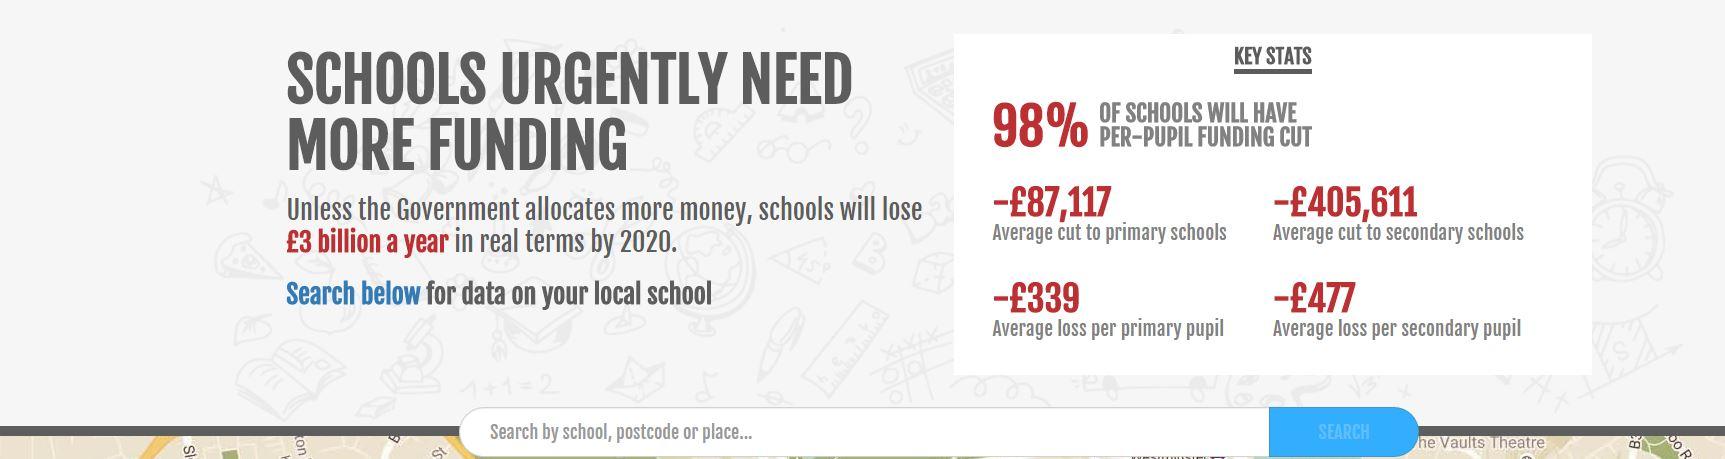 schoolfunding.JPG